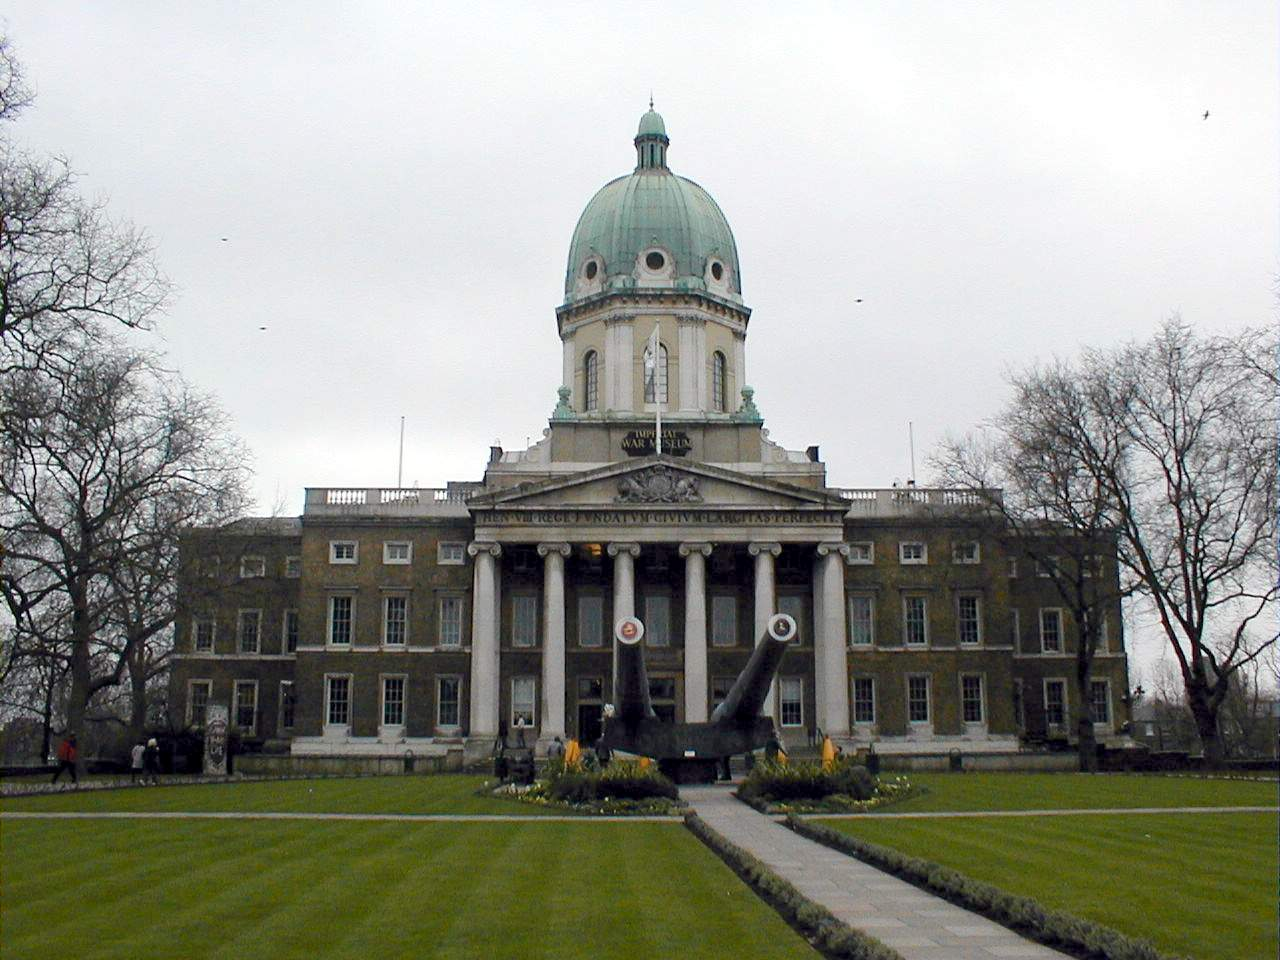 Imperial War Museum de Londres